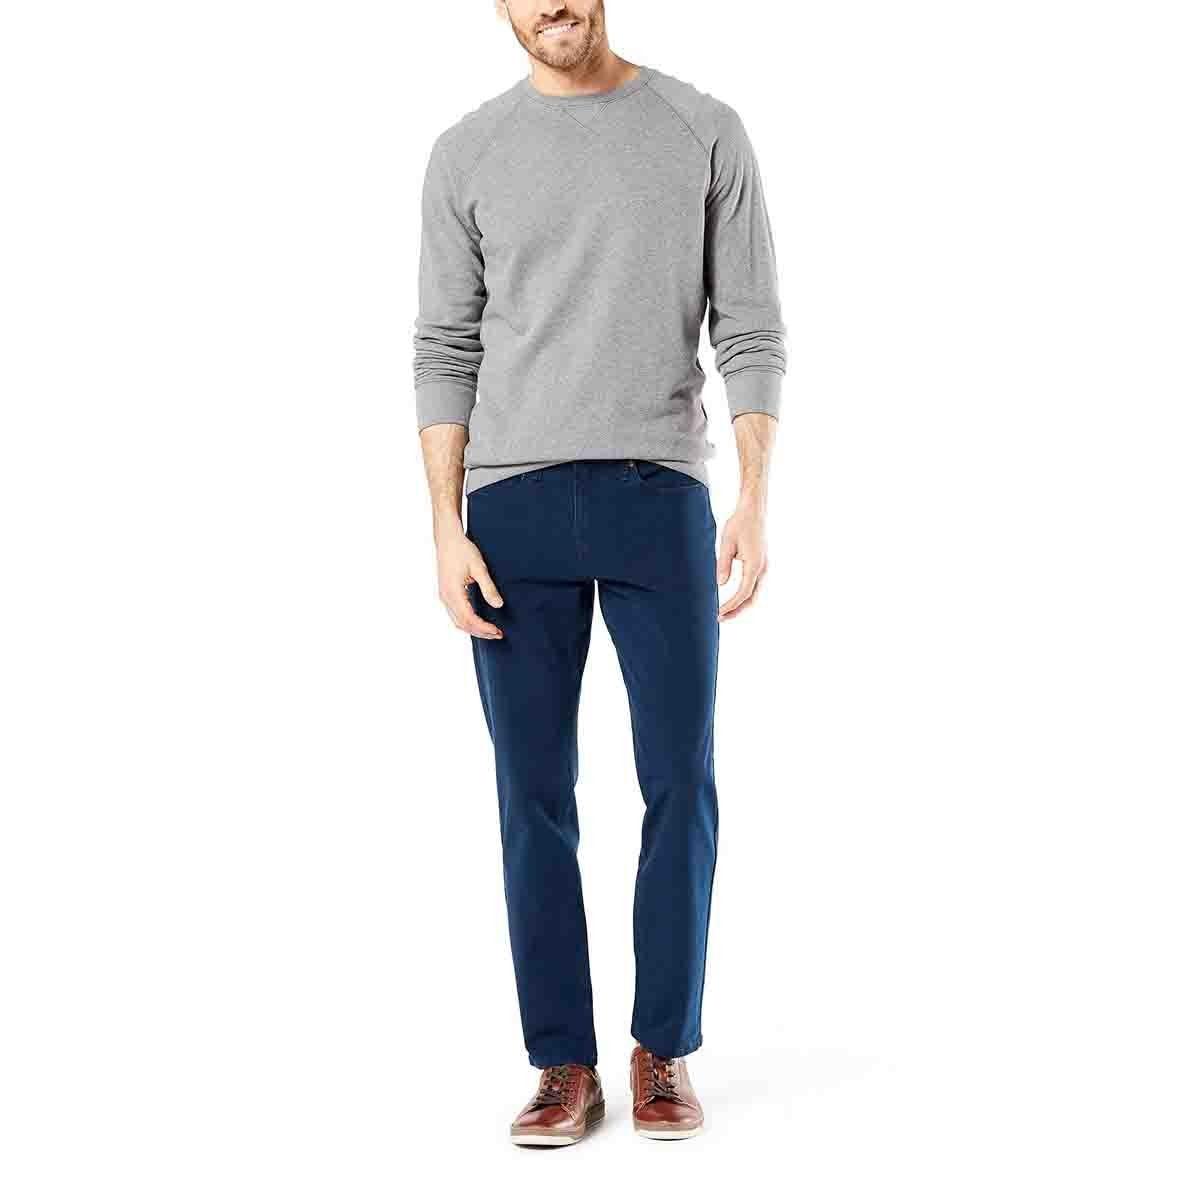 Pantalón 5 Pocket Slim Casual 360 Dockers para Caballero